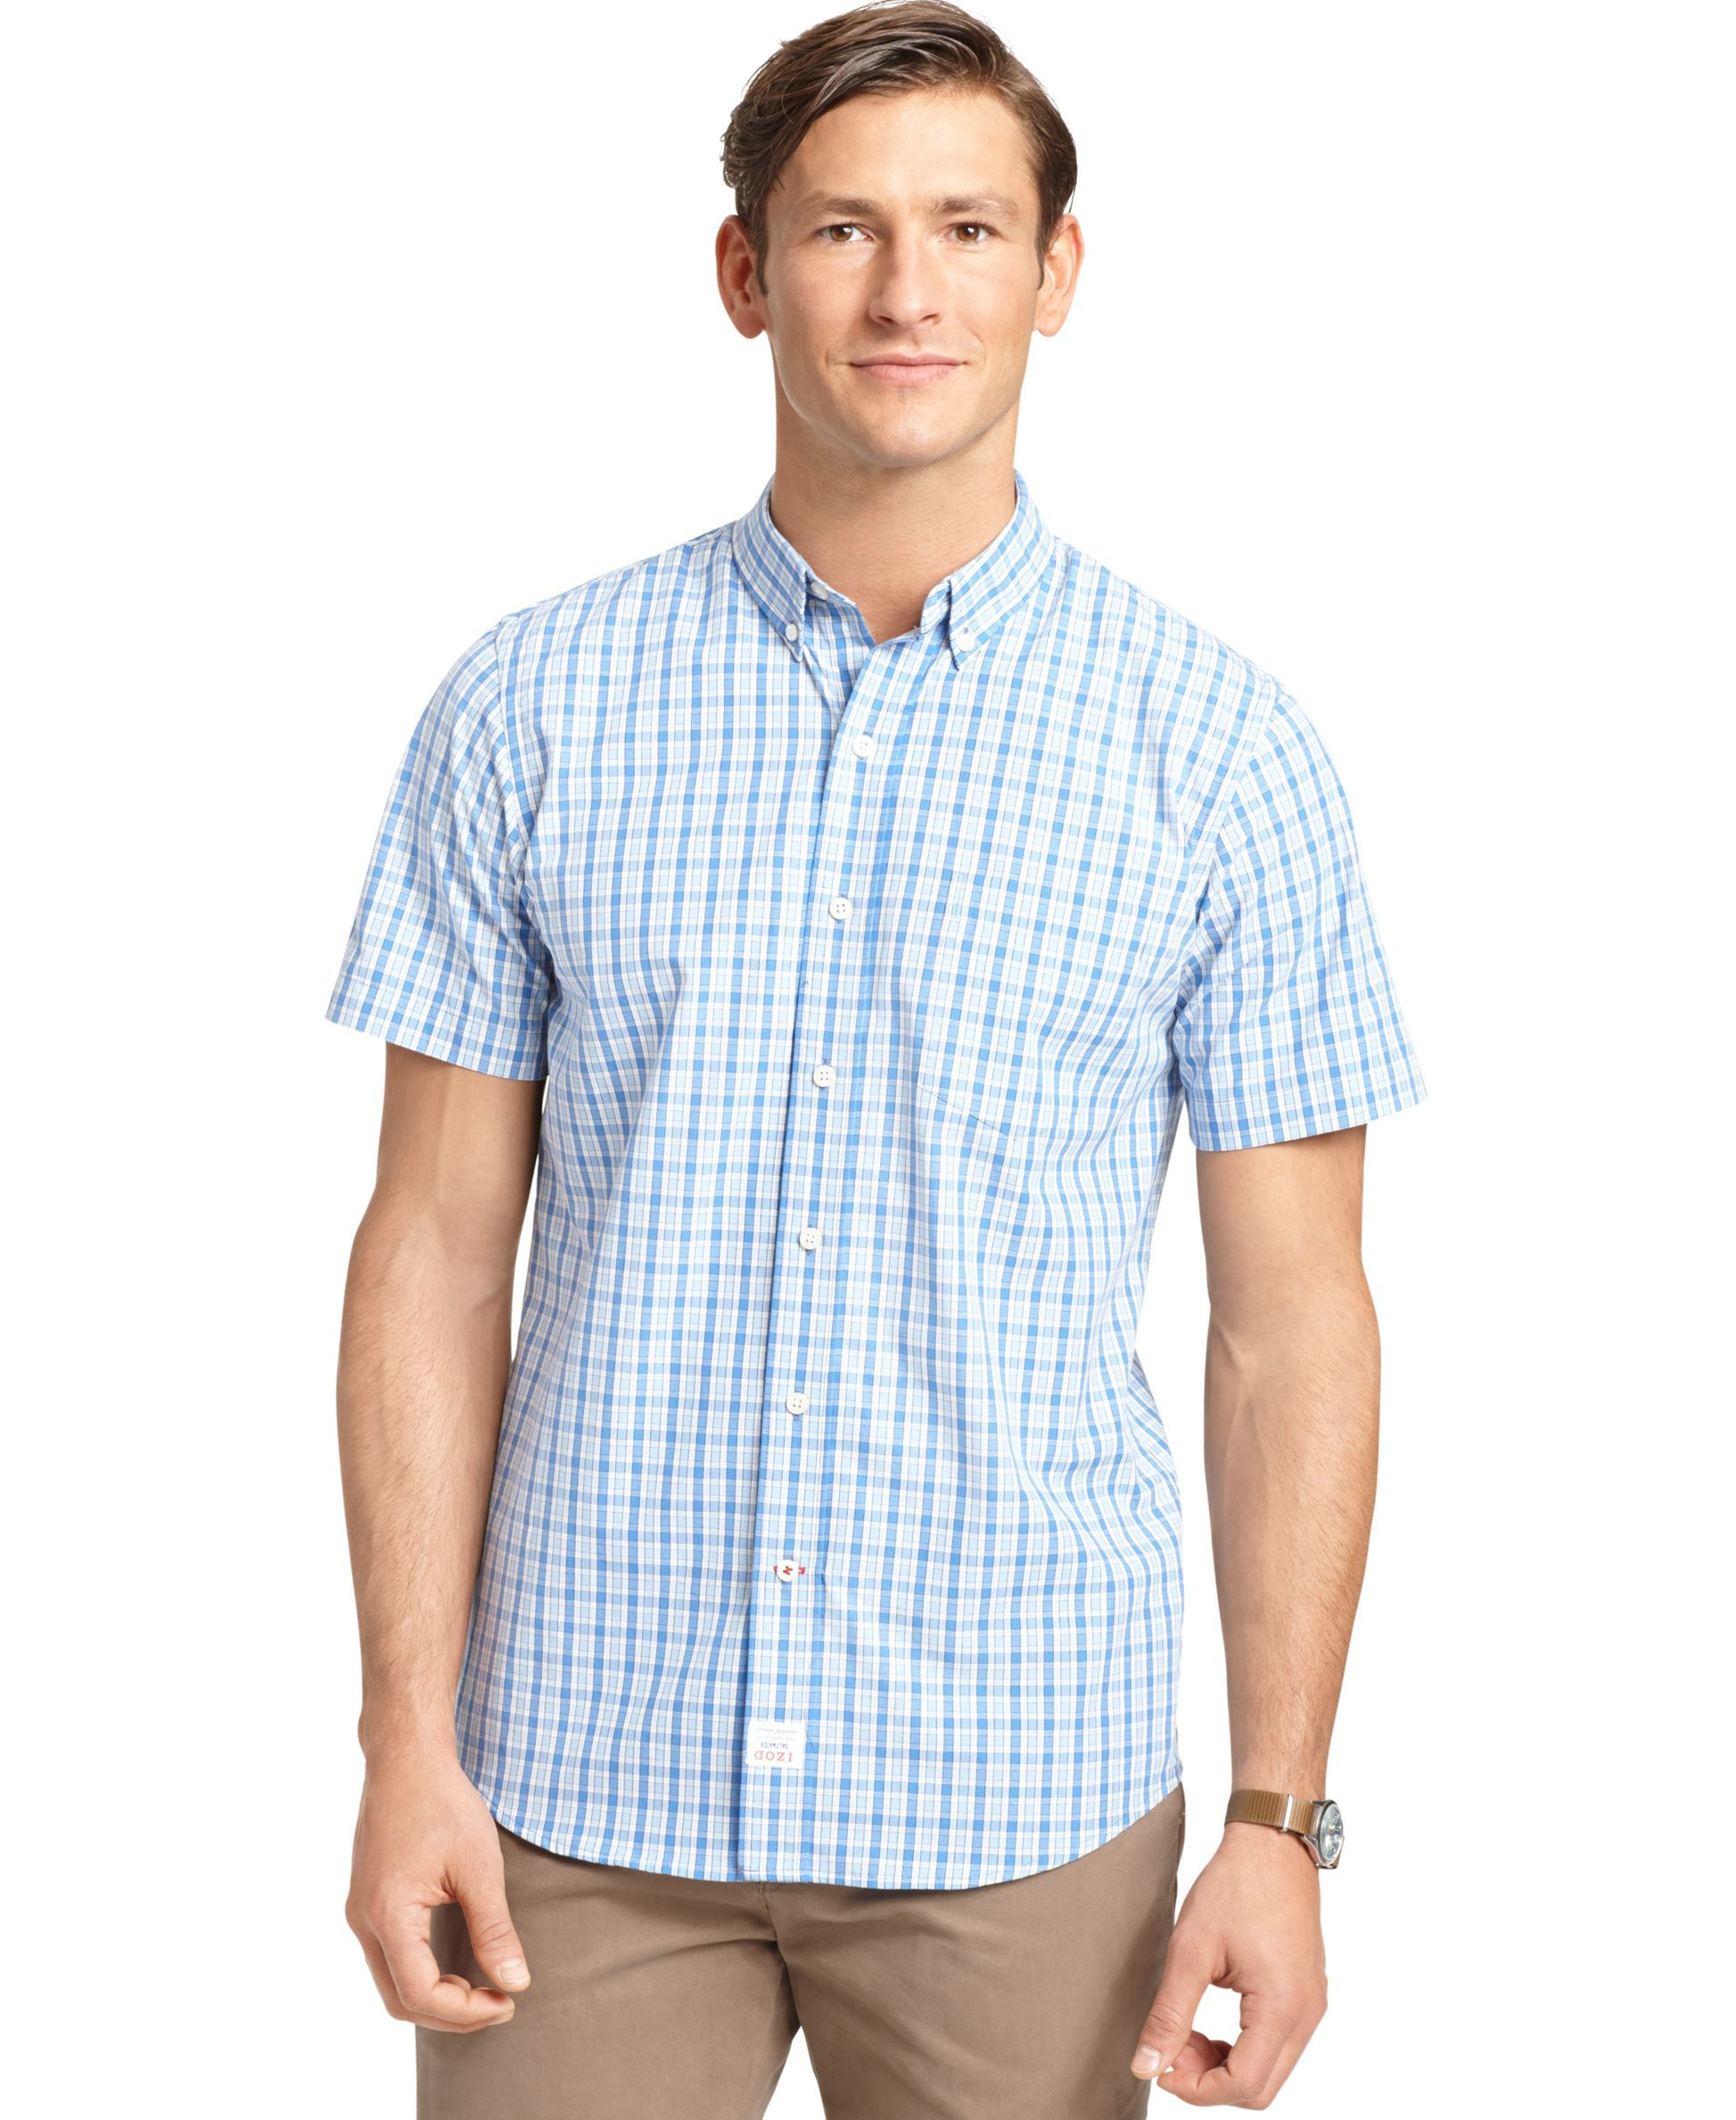 Izod Short-Sleeve Plaid Shirt | Products | Pinterest | Short ...